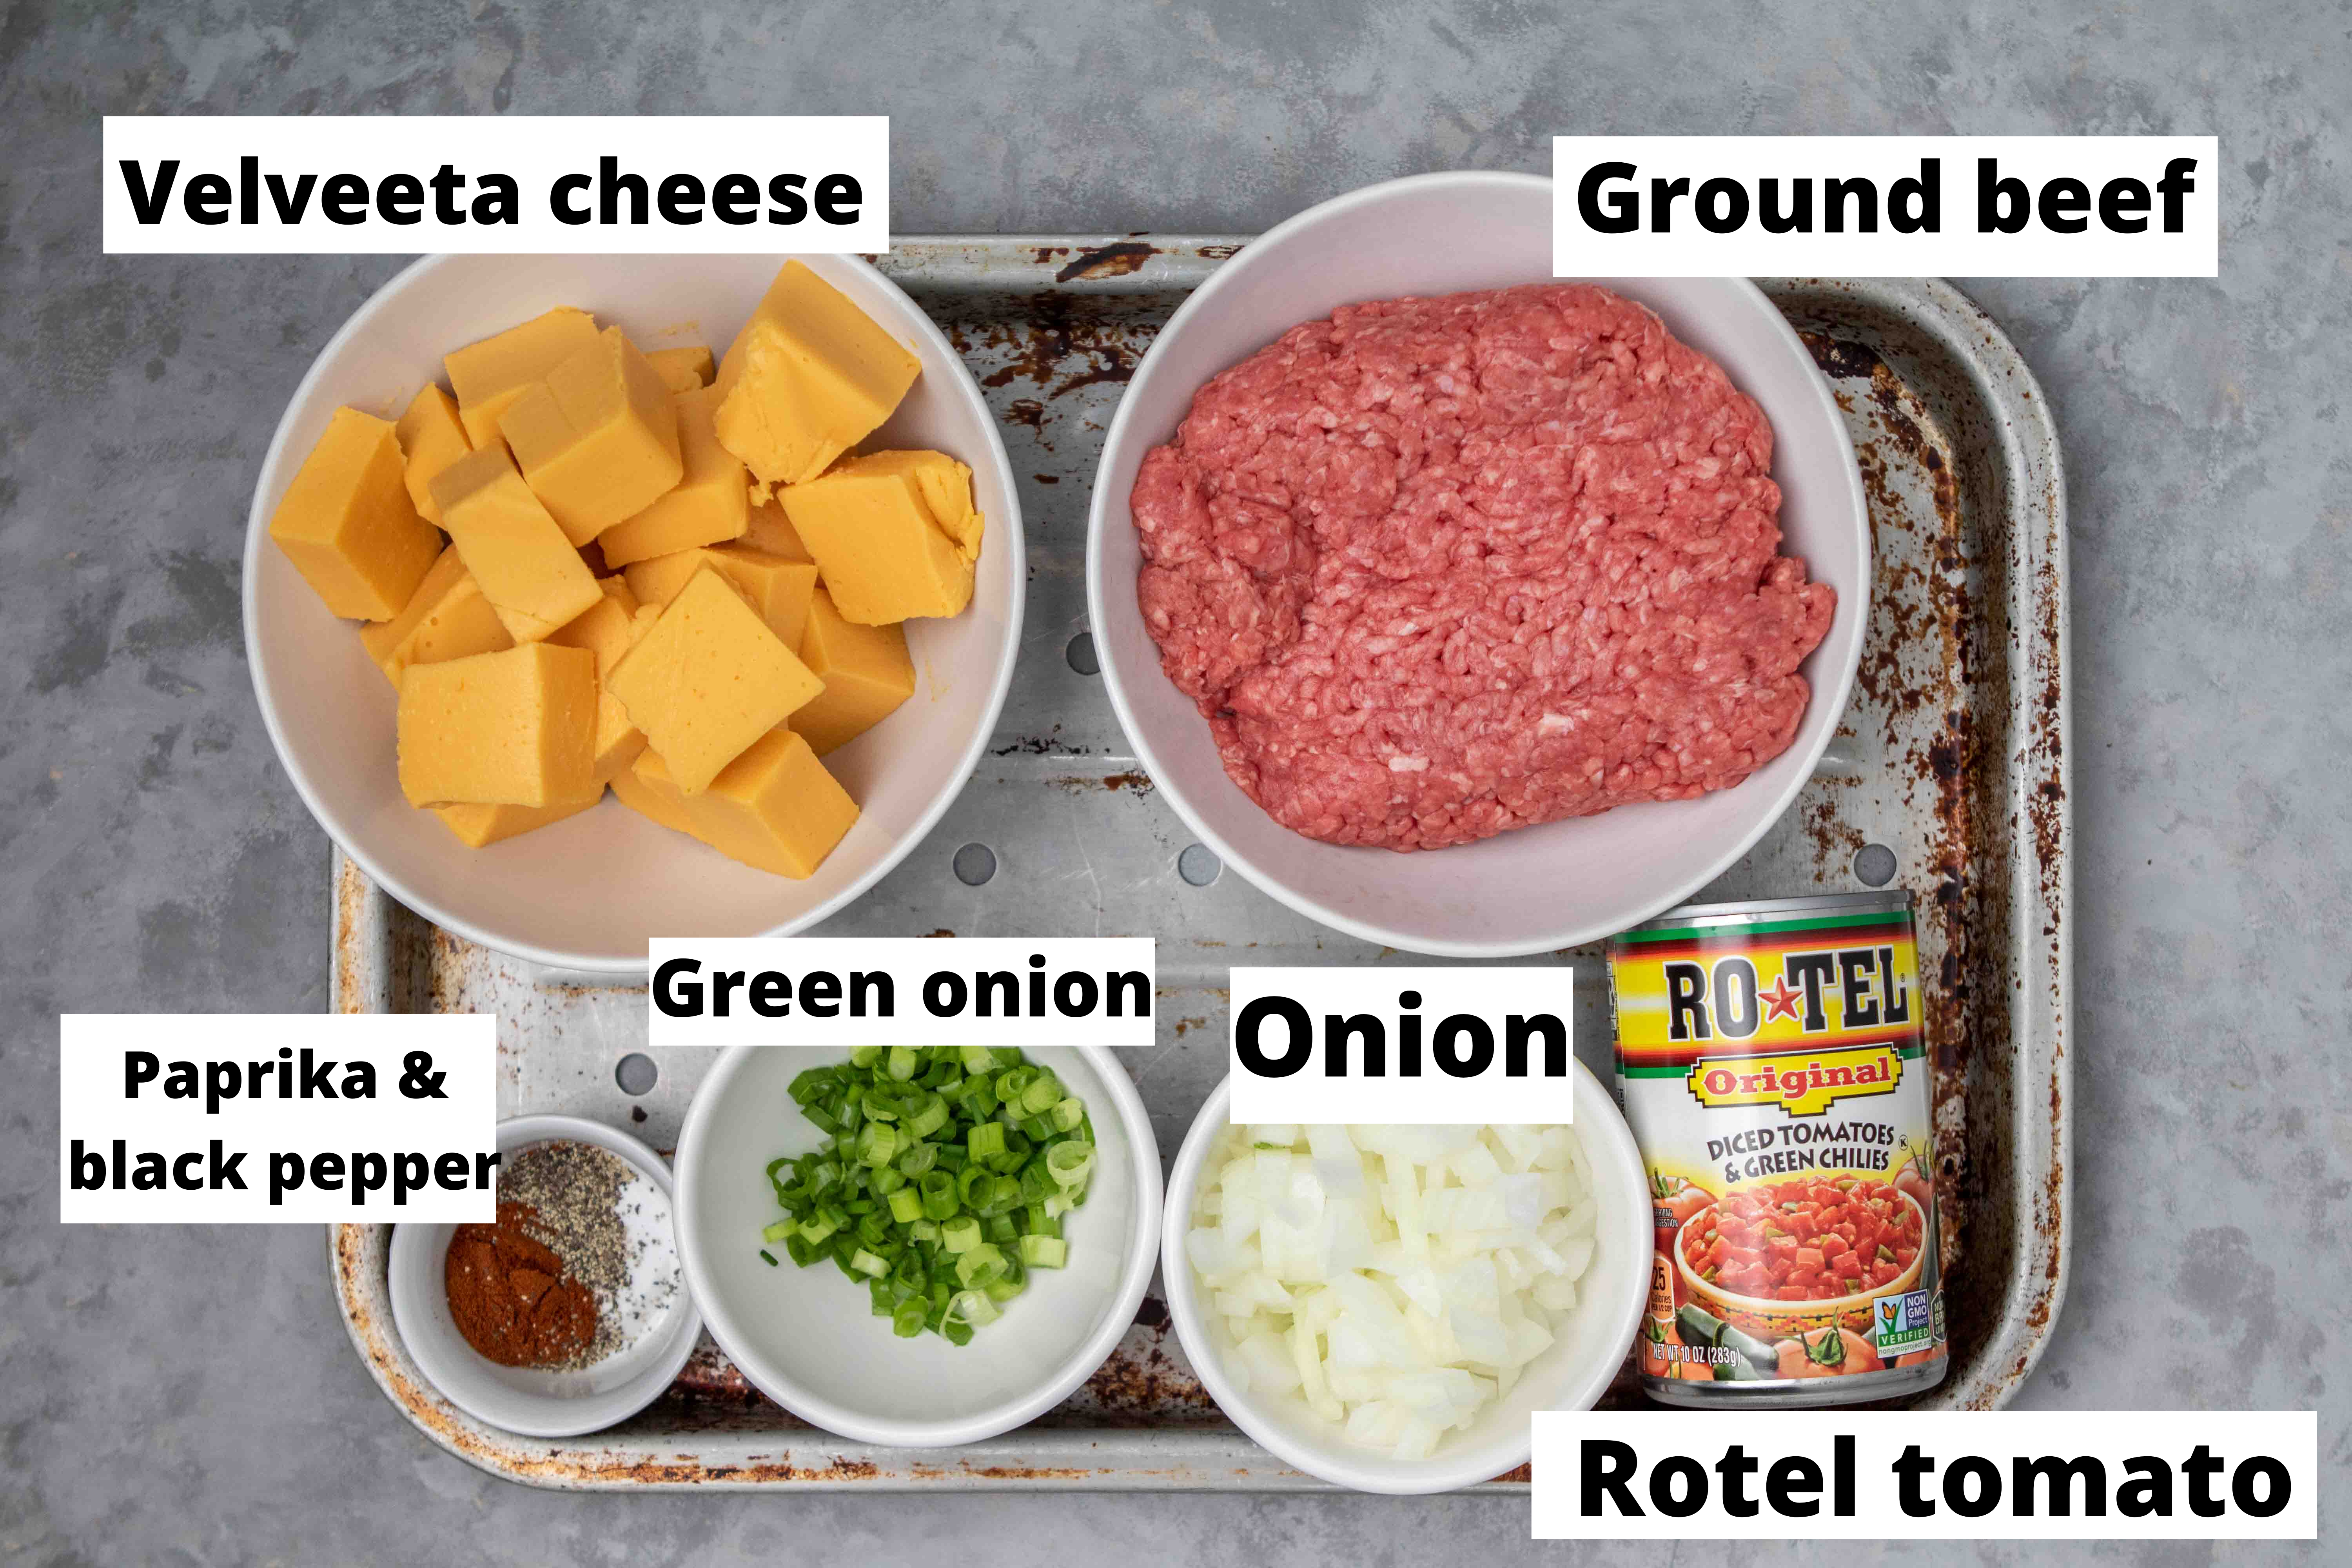 Ingredients for Rotel dip